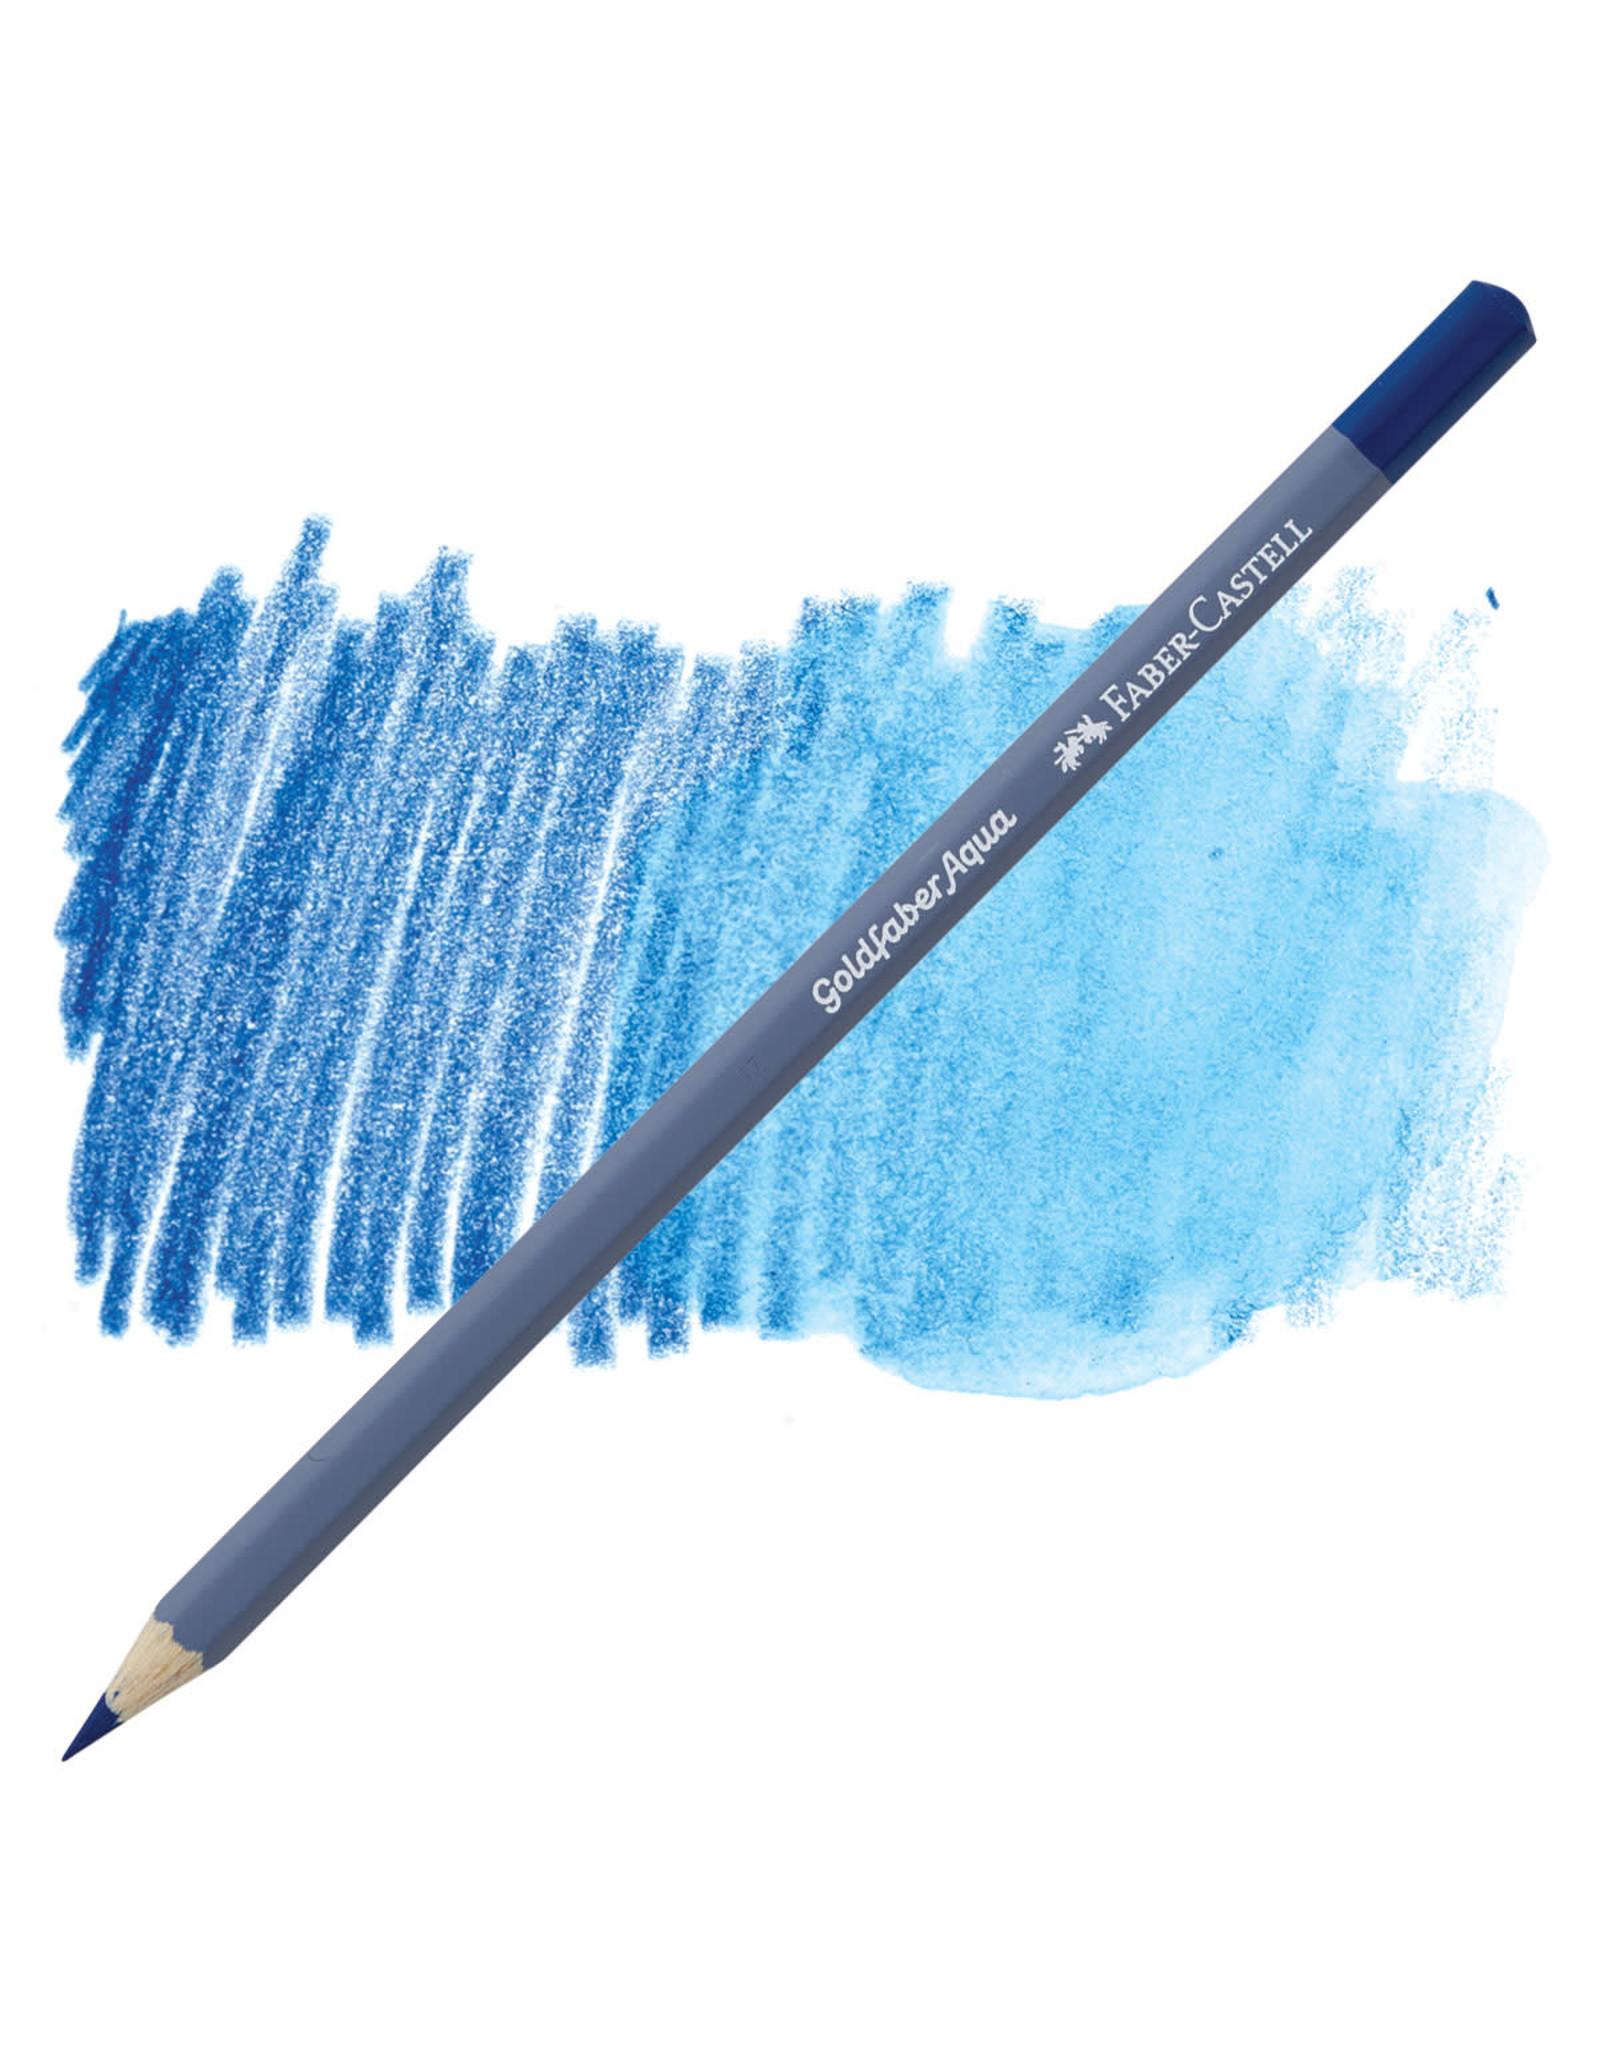 Faber-Castell Goldfaber Aqua Watercolor Pencil - Helioblue Reddish #151